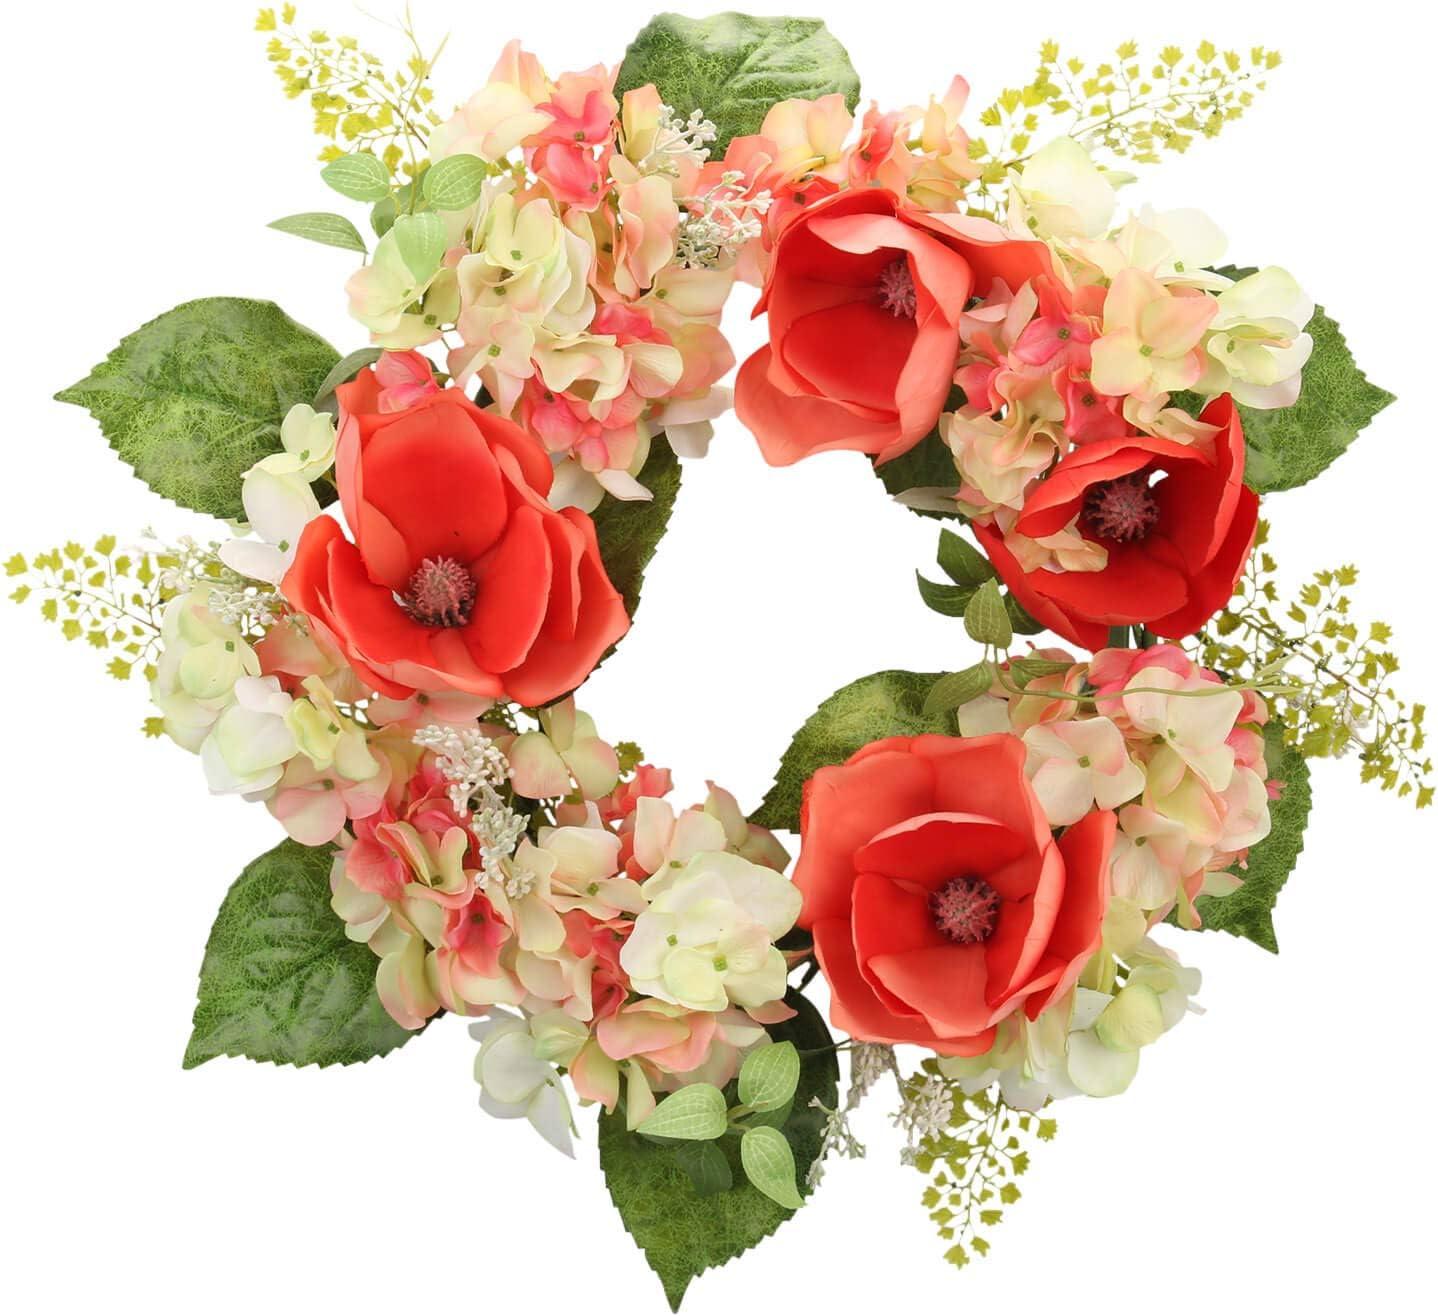 Cloris Art Summer Wreath for Front Door, 22 Inch Artificial Magnolia Hydrangea Wreath for Home Office Wedding Party, Spring Door Wreaths for Farmhouse Decor (Red)